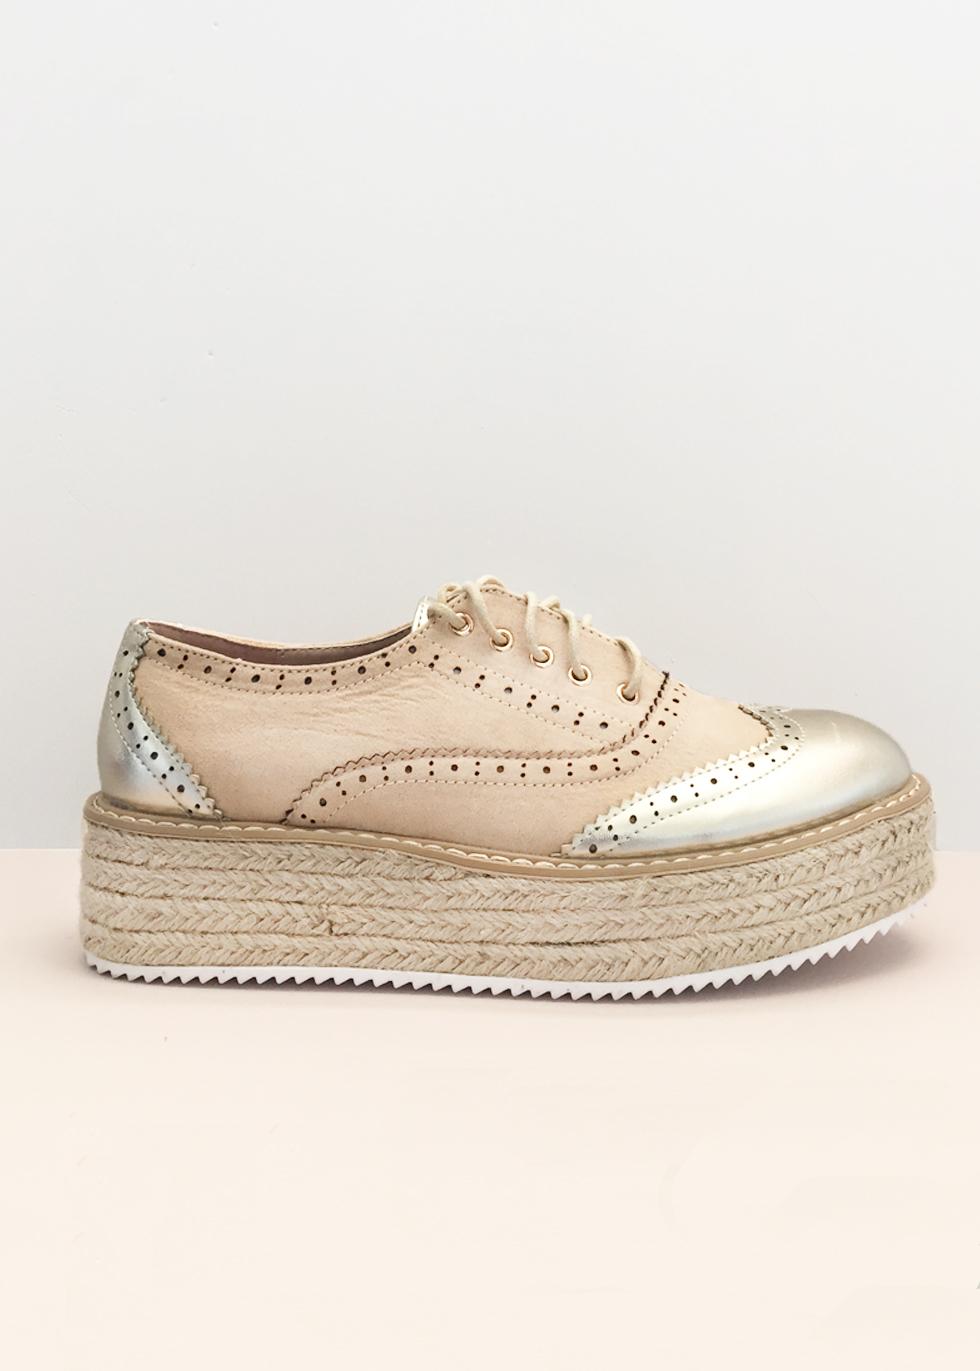 Alexa metallic espadrilles, μπεζ παπούτσια